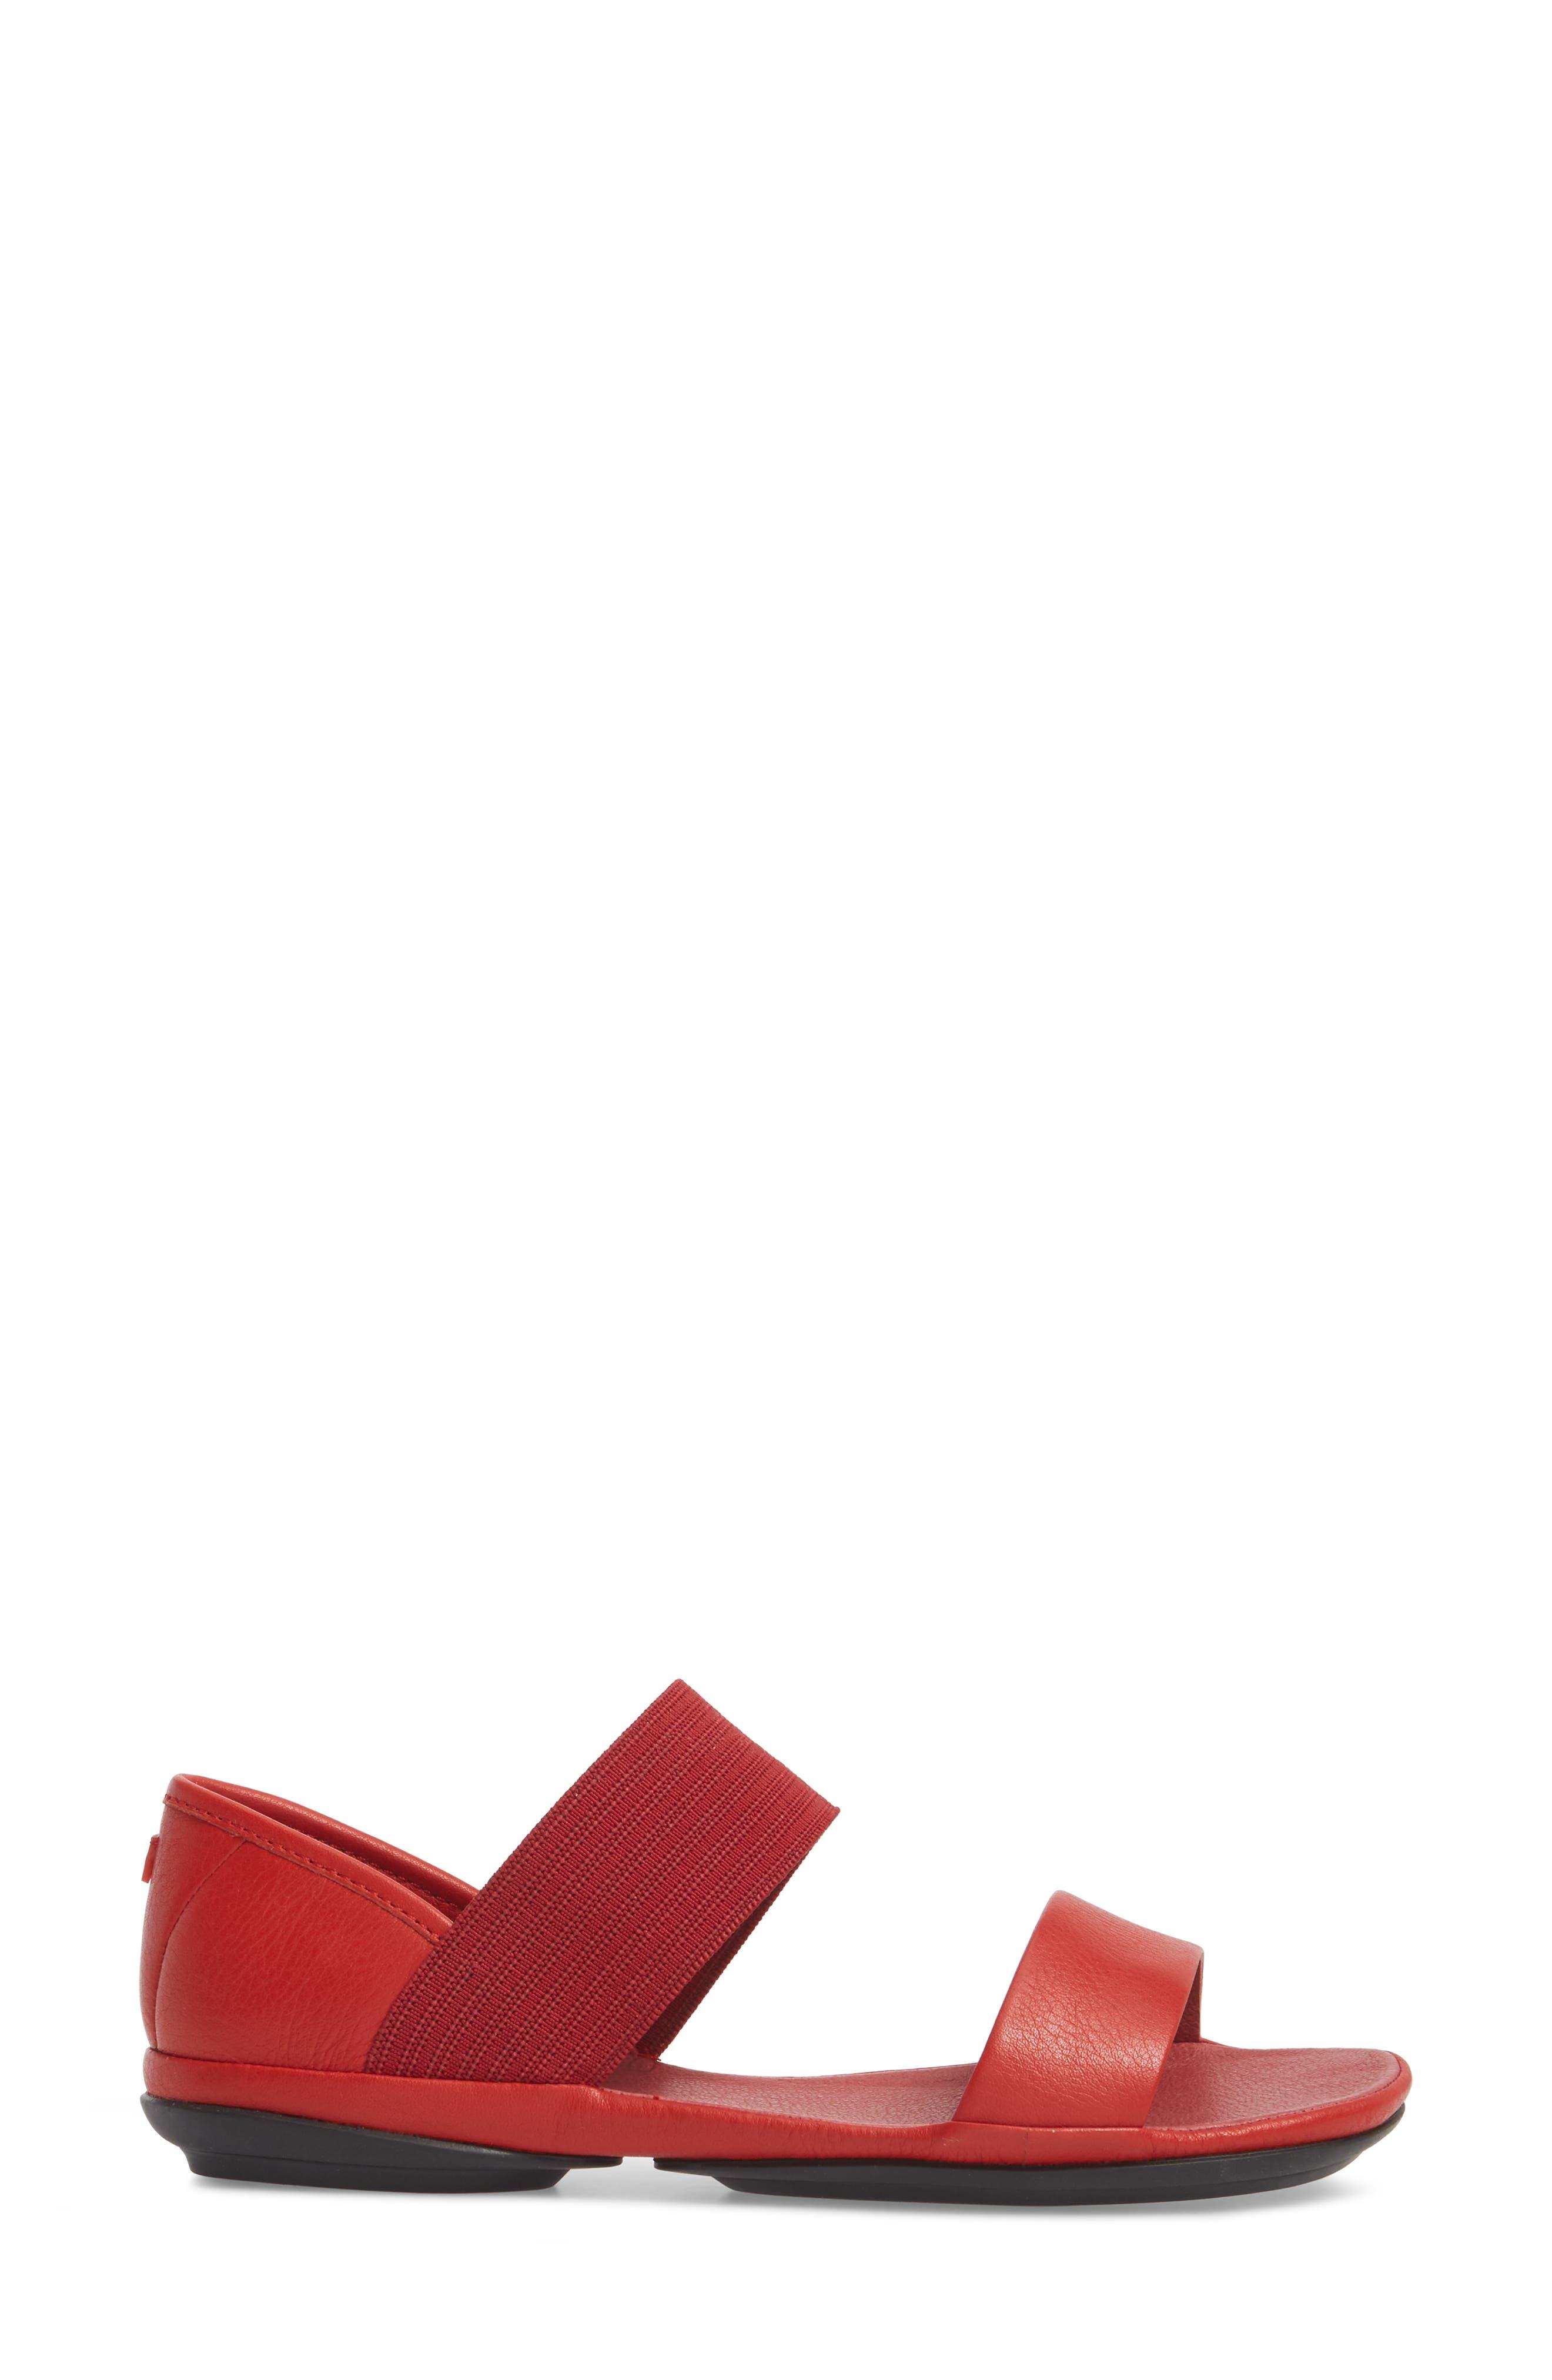 Right Nina Sandal,                             Alternate thumbnail 3, color,                             Medium Red Leather